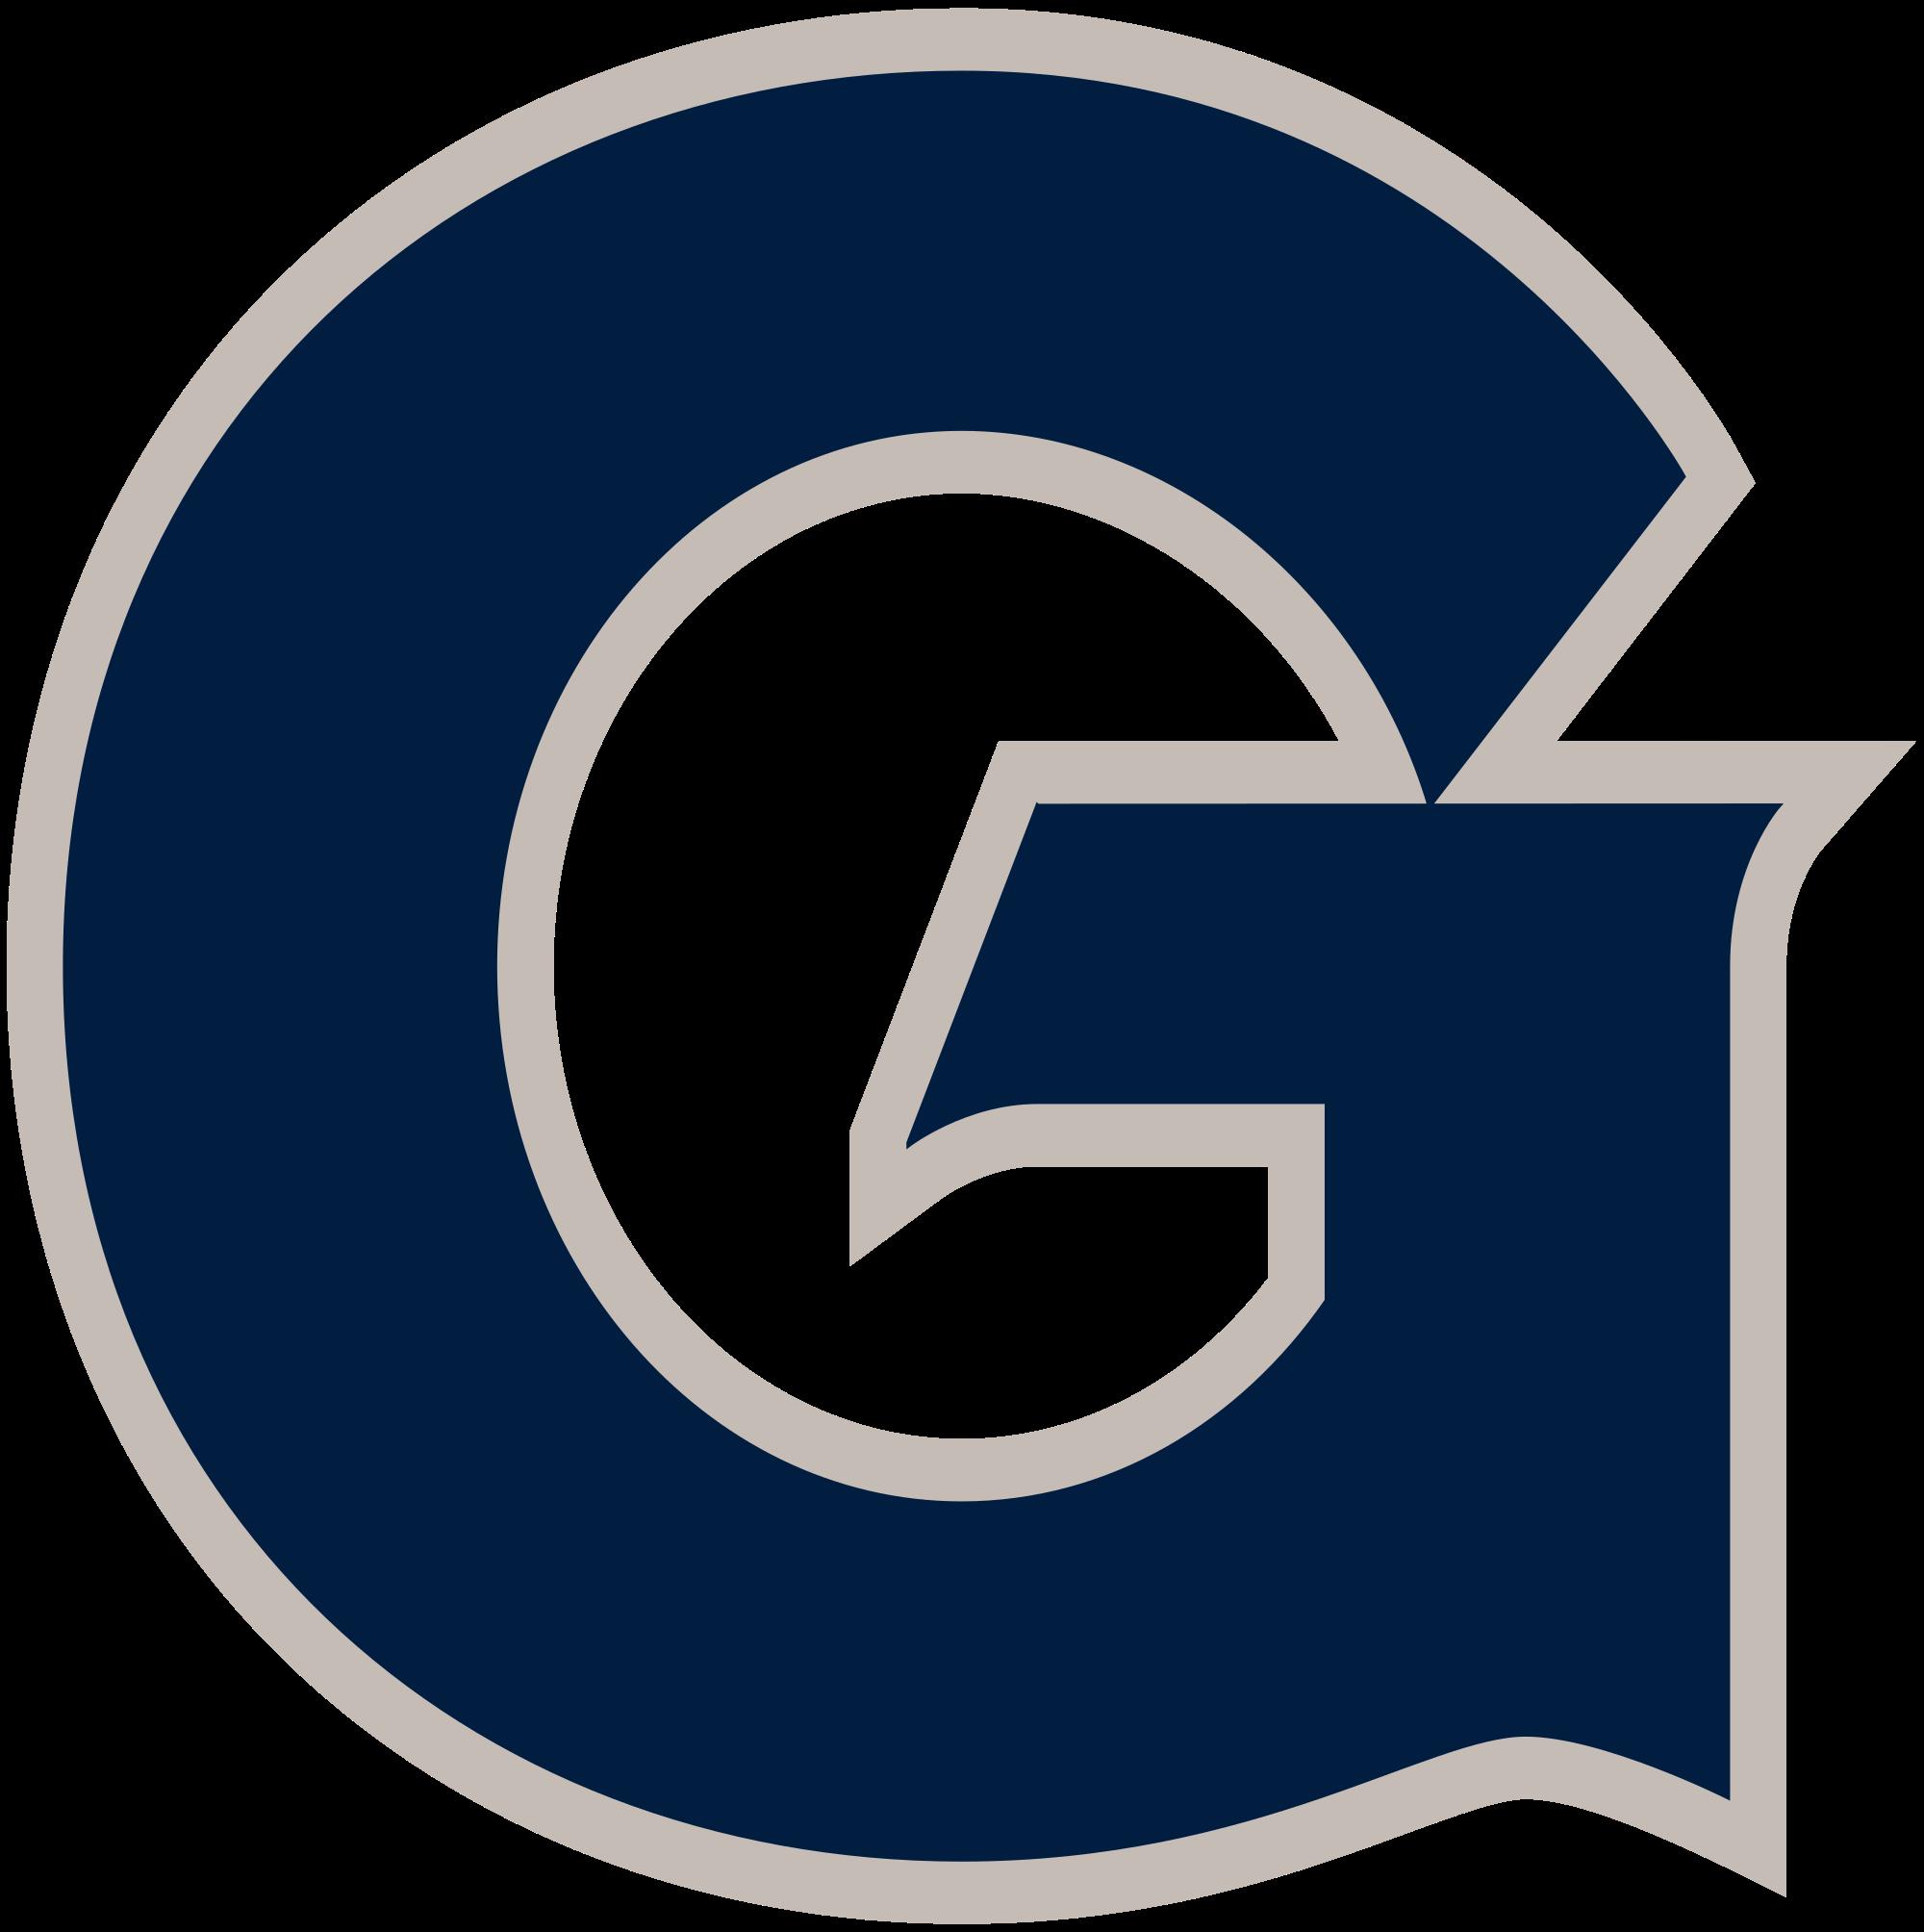 Georgetown Hoyas - Wikipedia